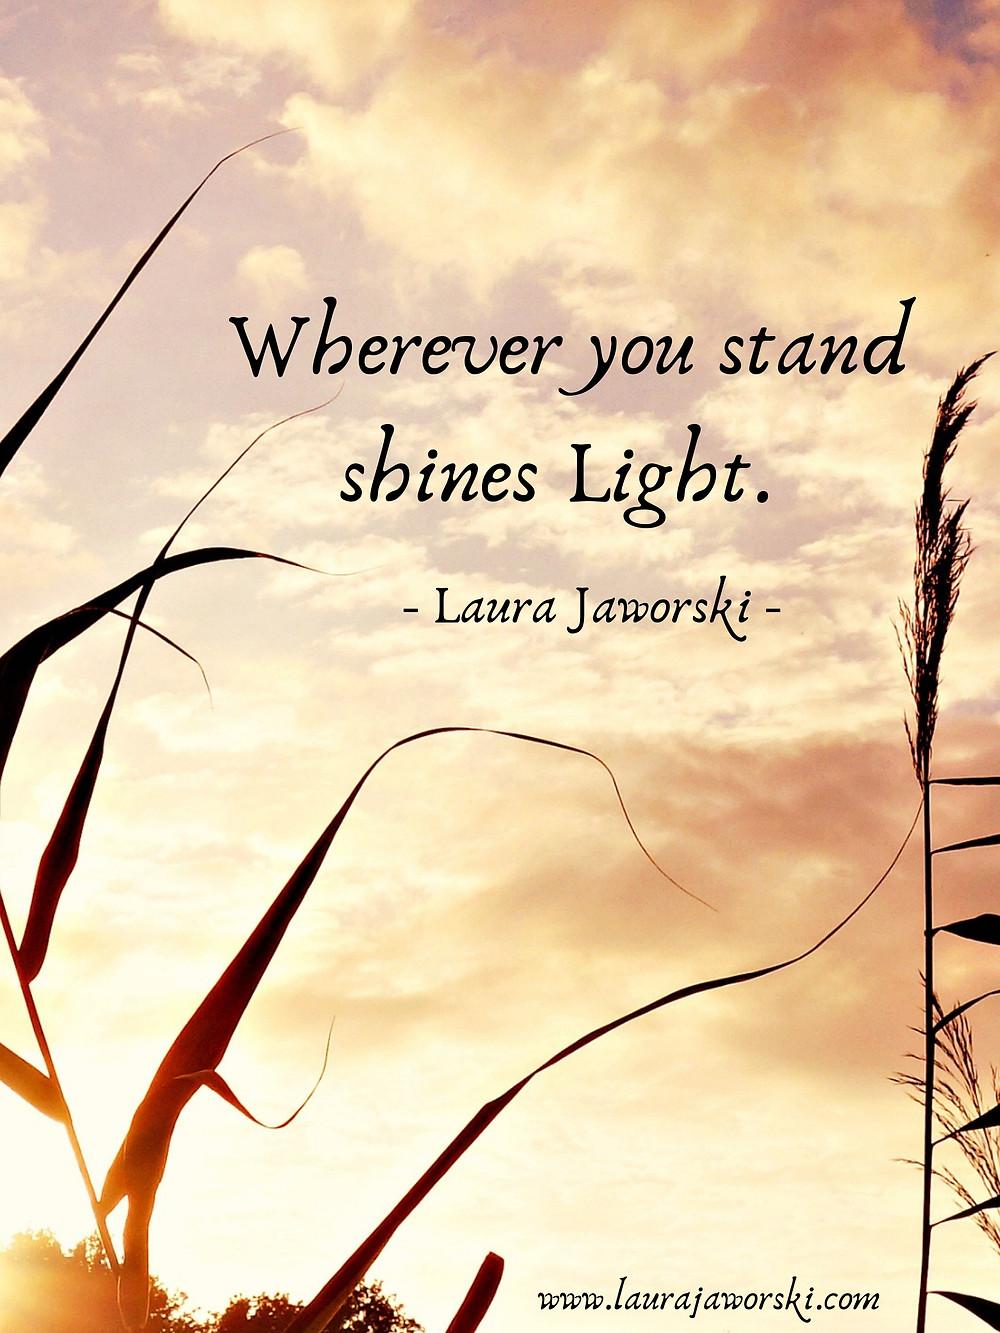 """Wherever you stand shines Light."" ~ Laura Jaworski"